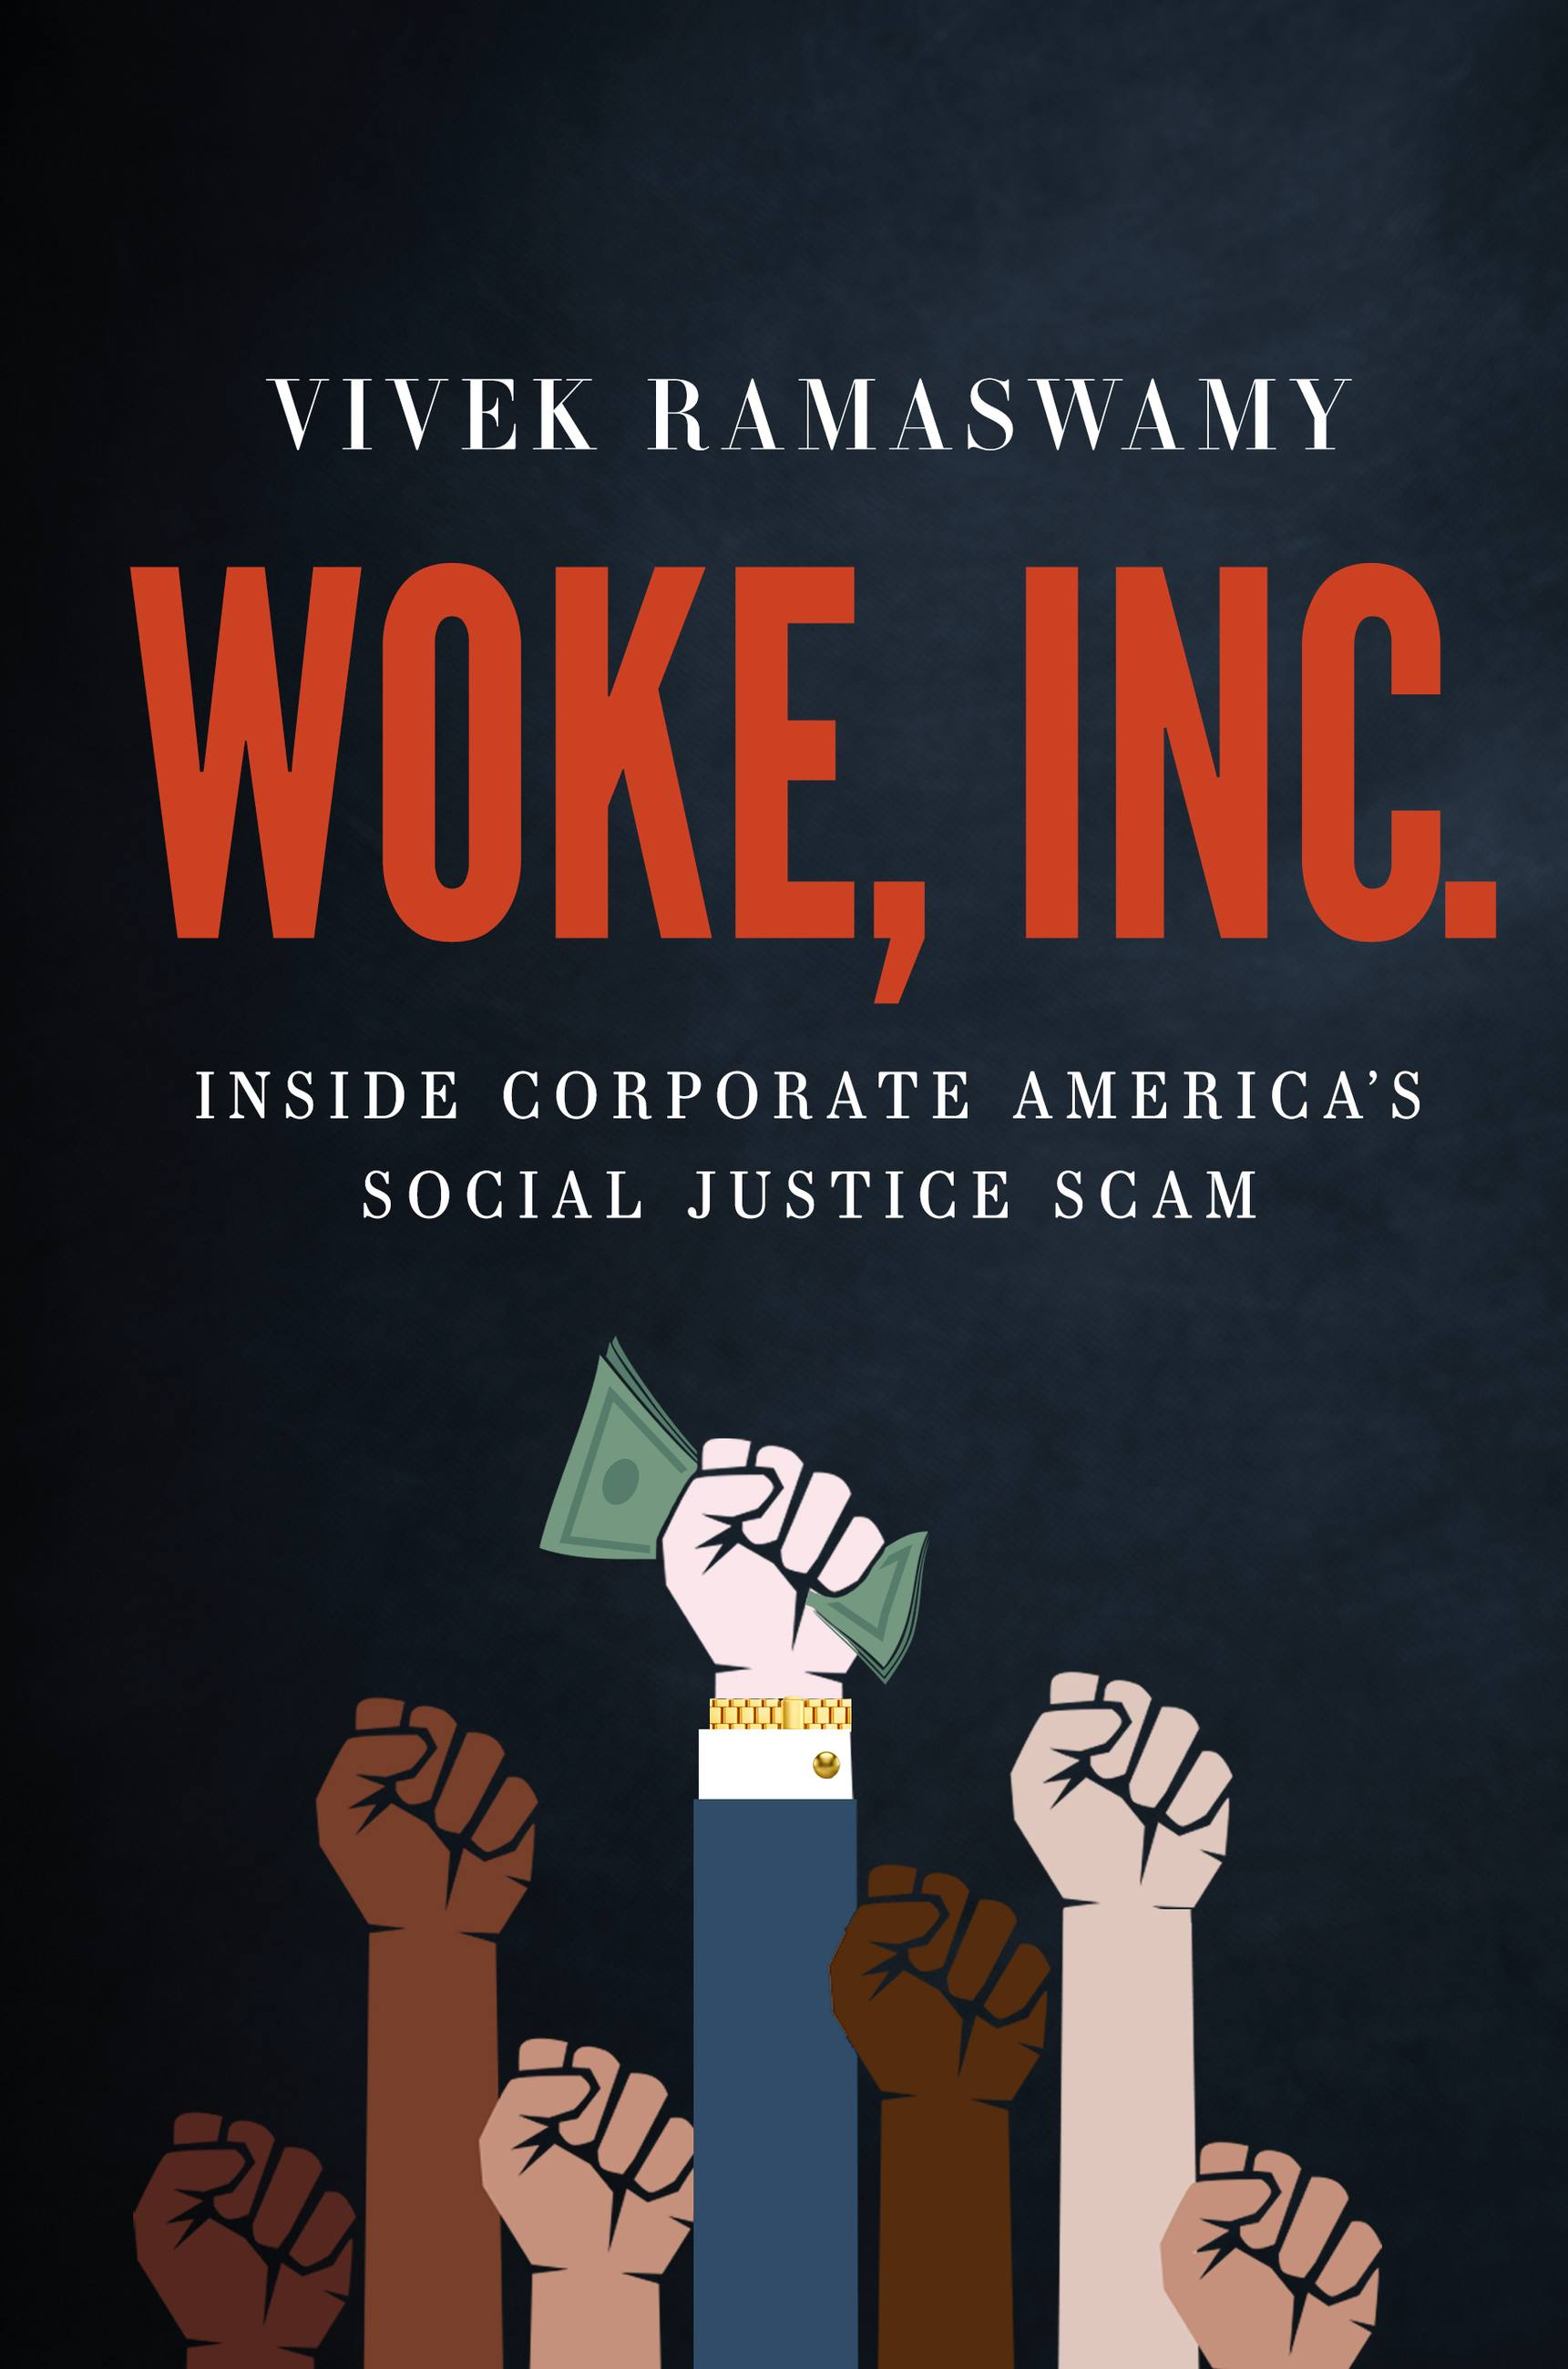 Woke, Inc. Inside Corporate America's Social Justice Scam